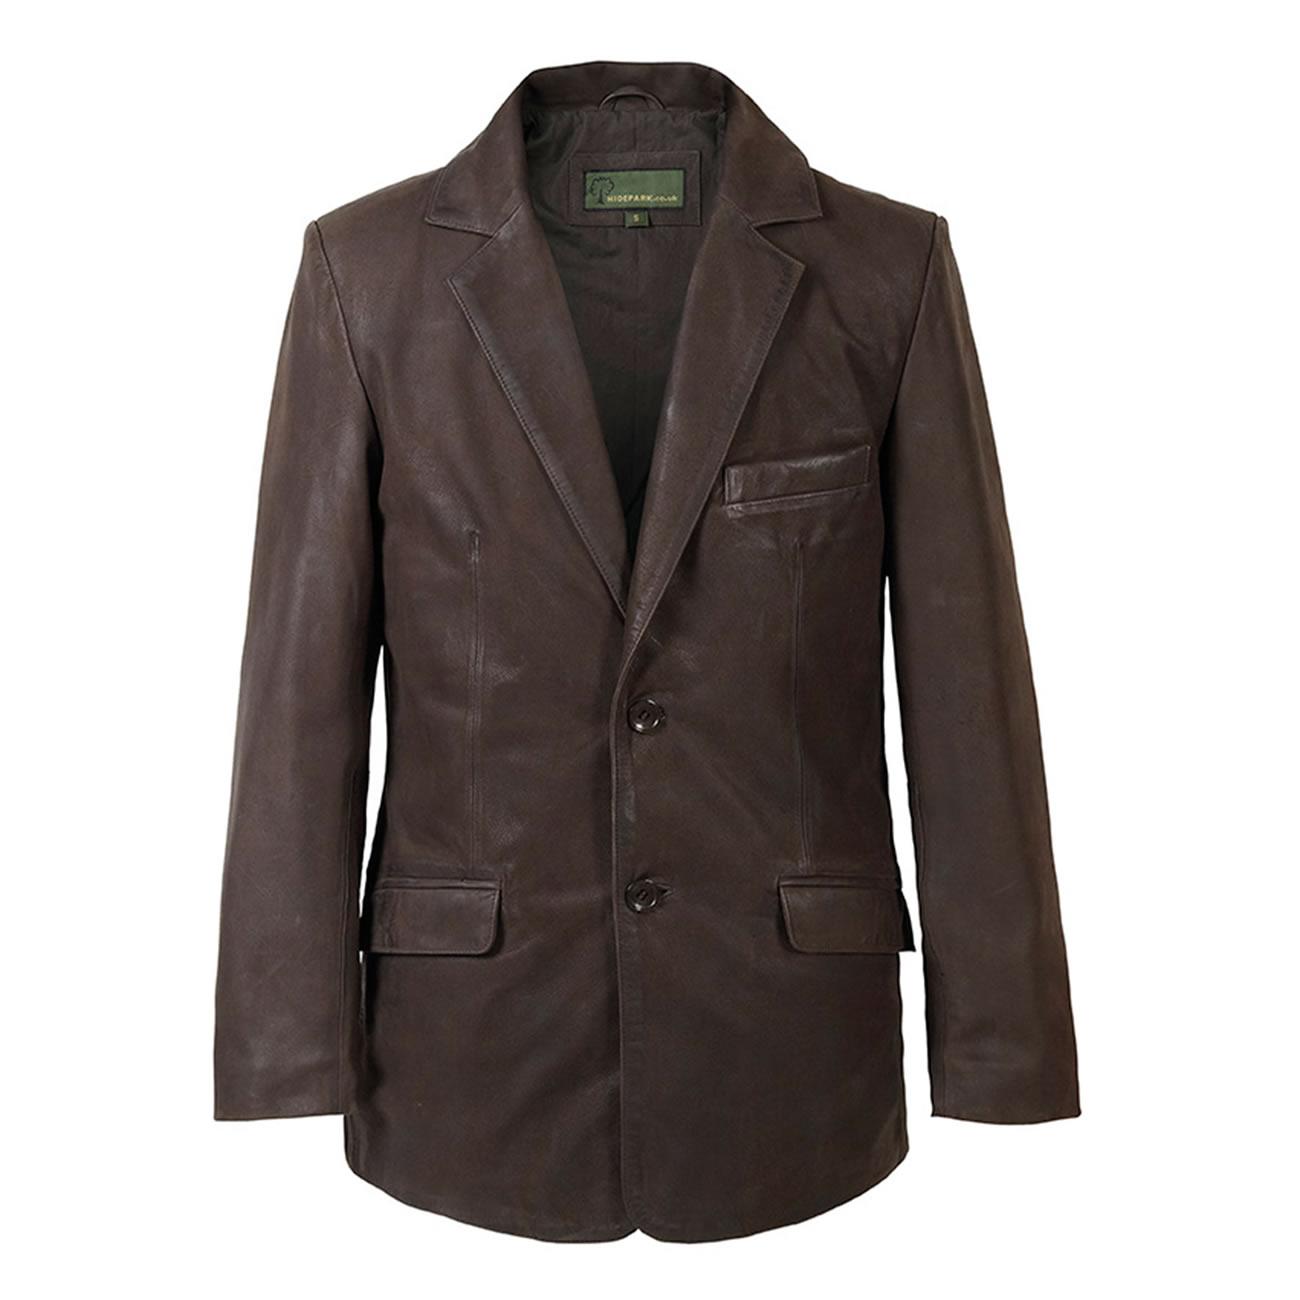 Gents Nubuck Leather Blazer Brown